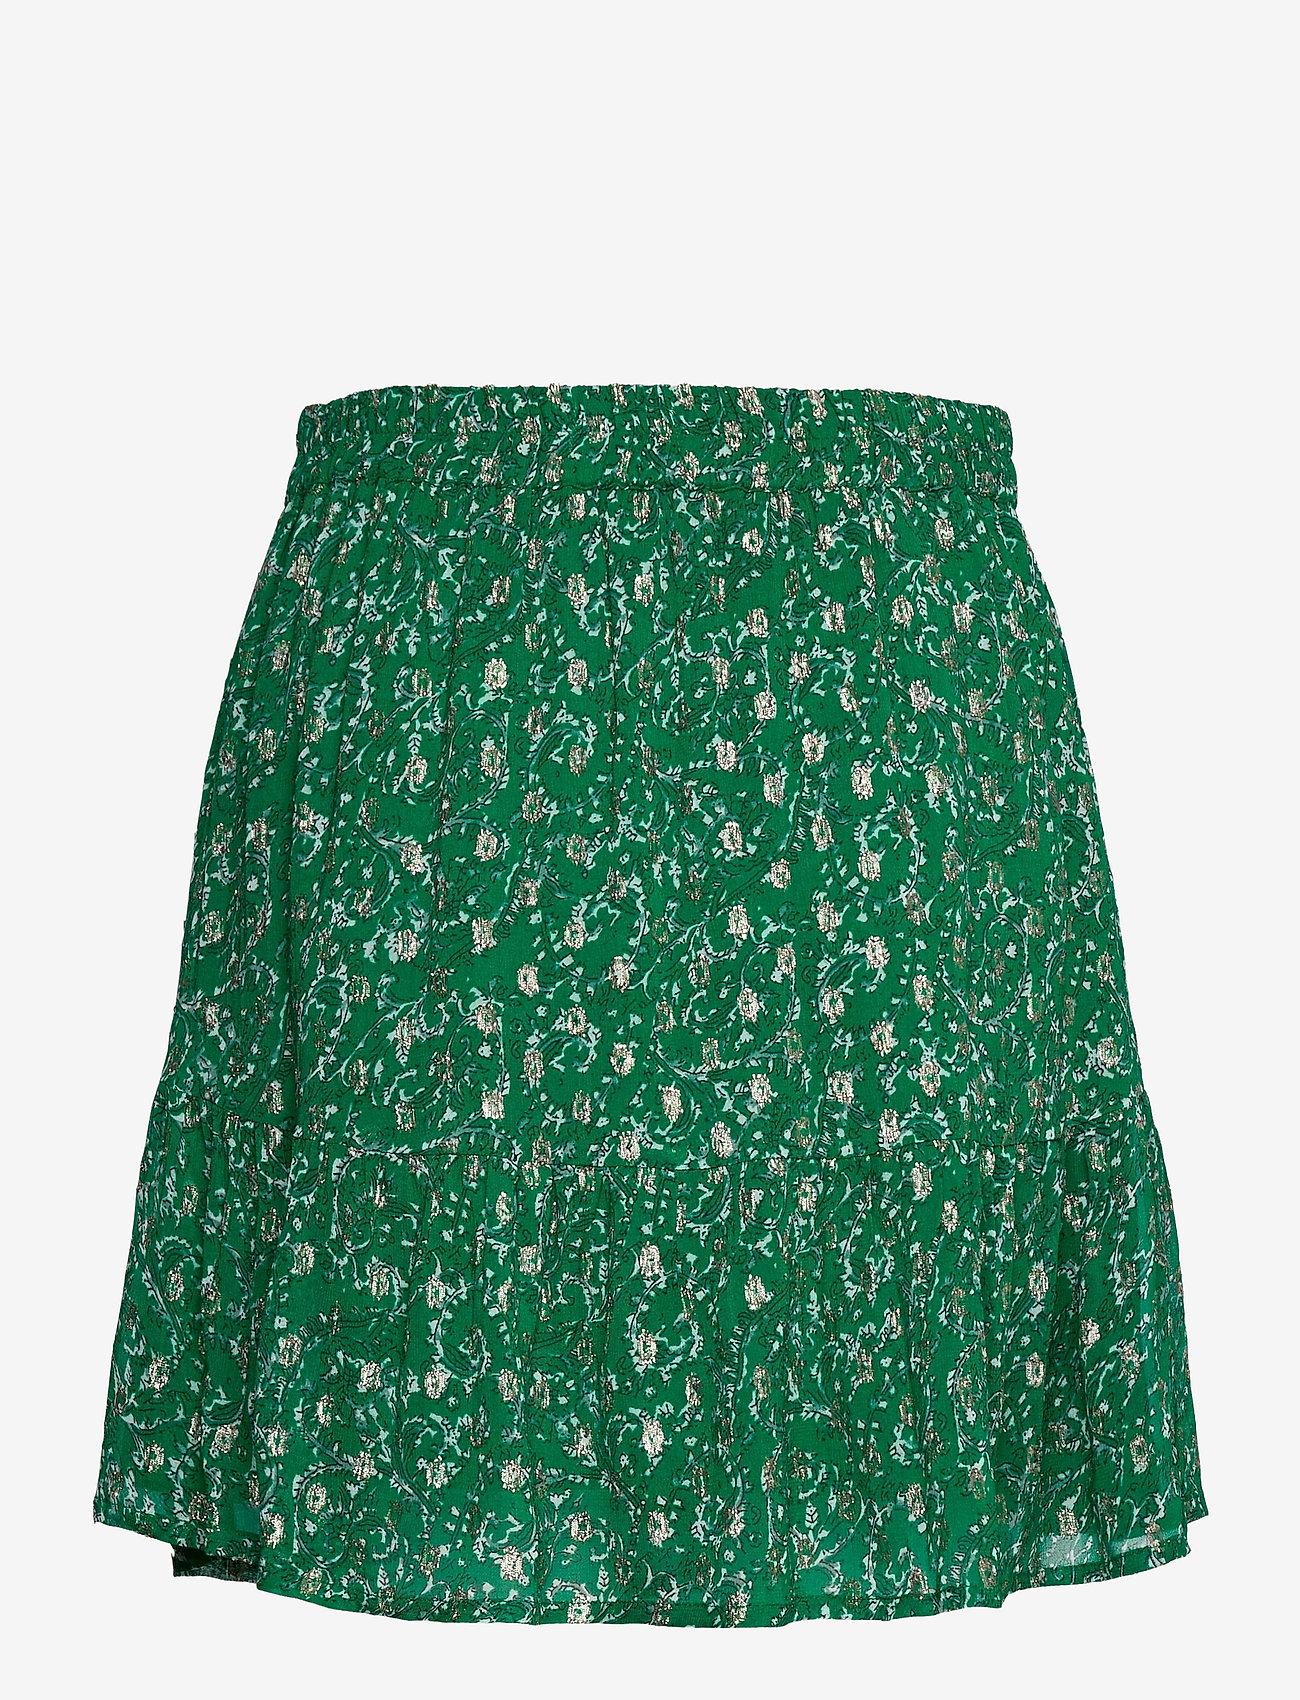 Lollys Laundry - Alexa Skirt - dark green - 1